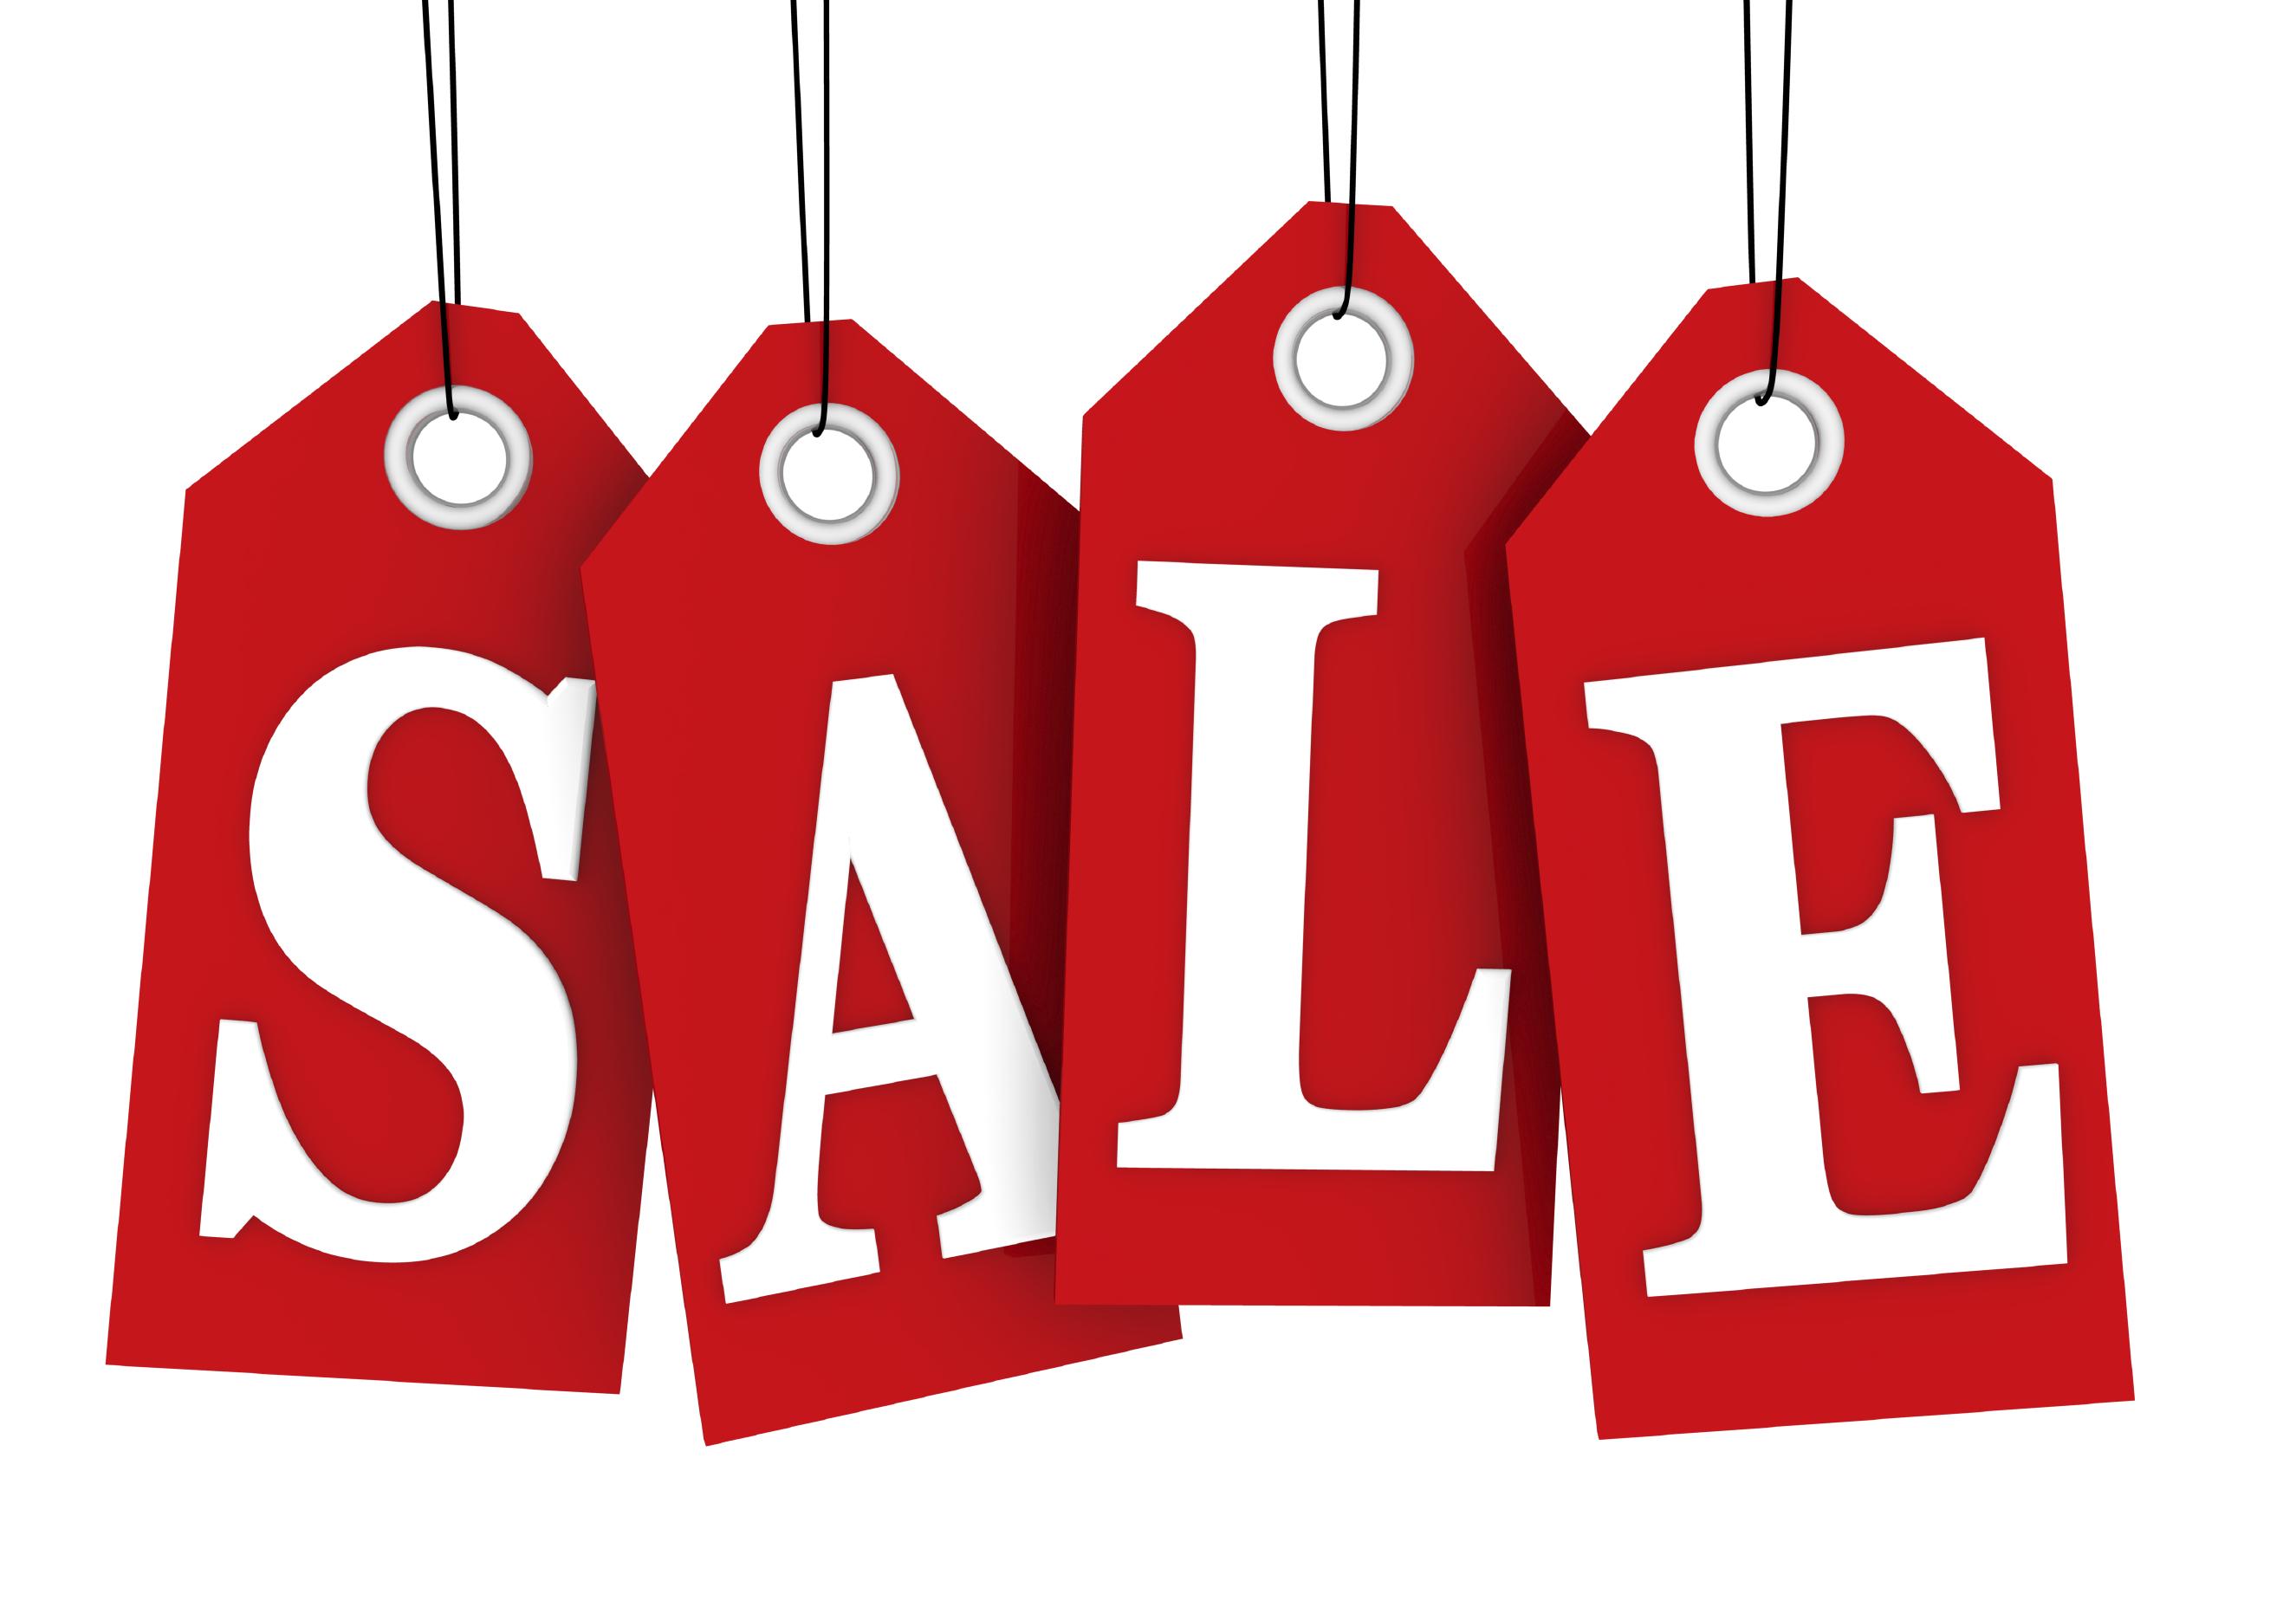 Clipart sales